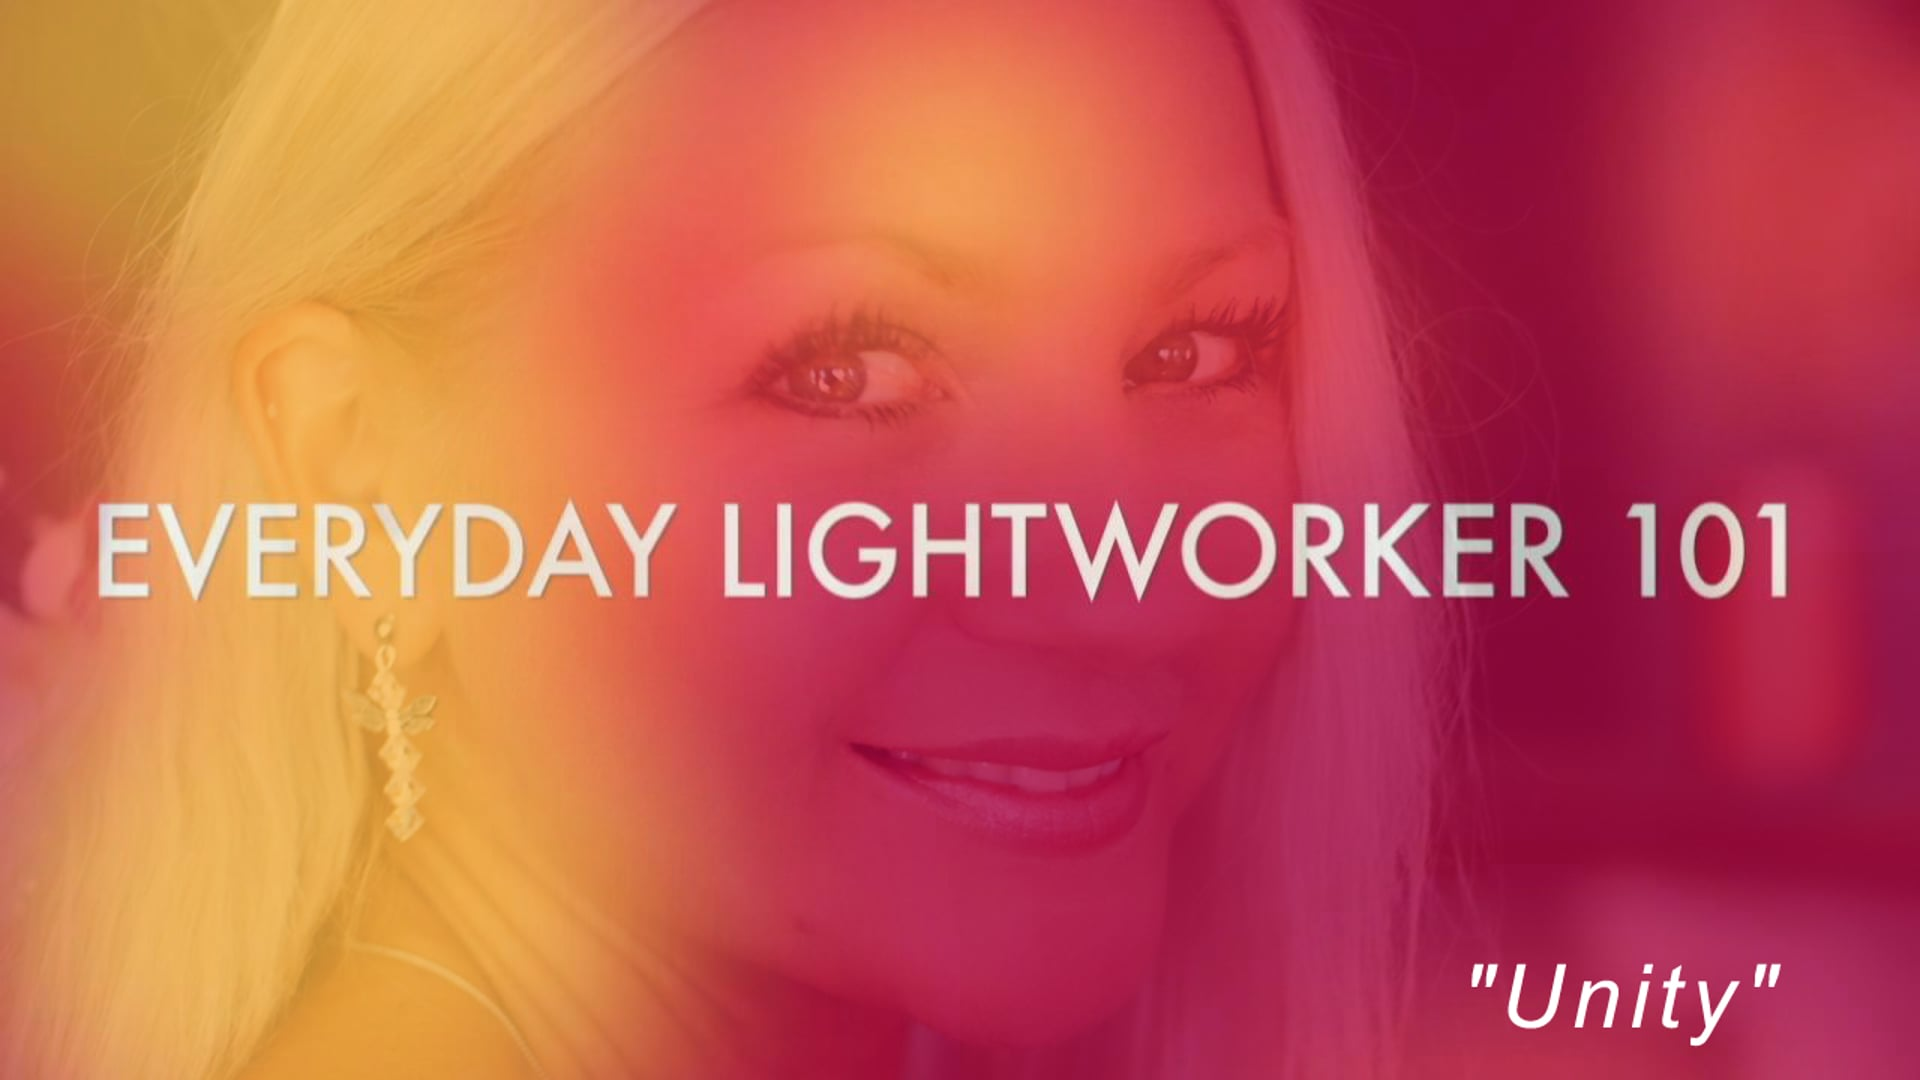 Everyday Lightworker 101:Unity